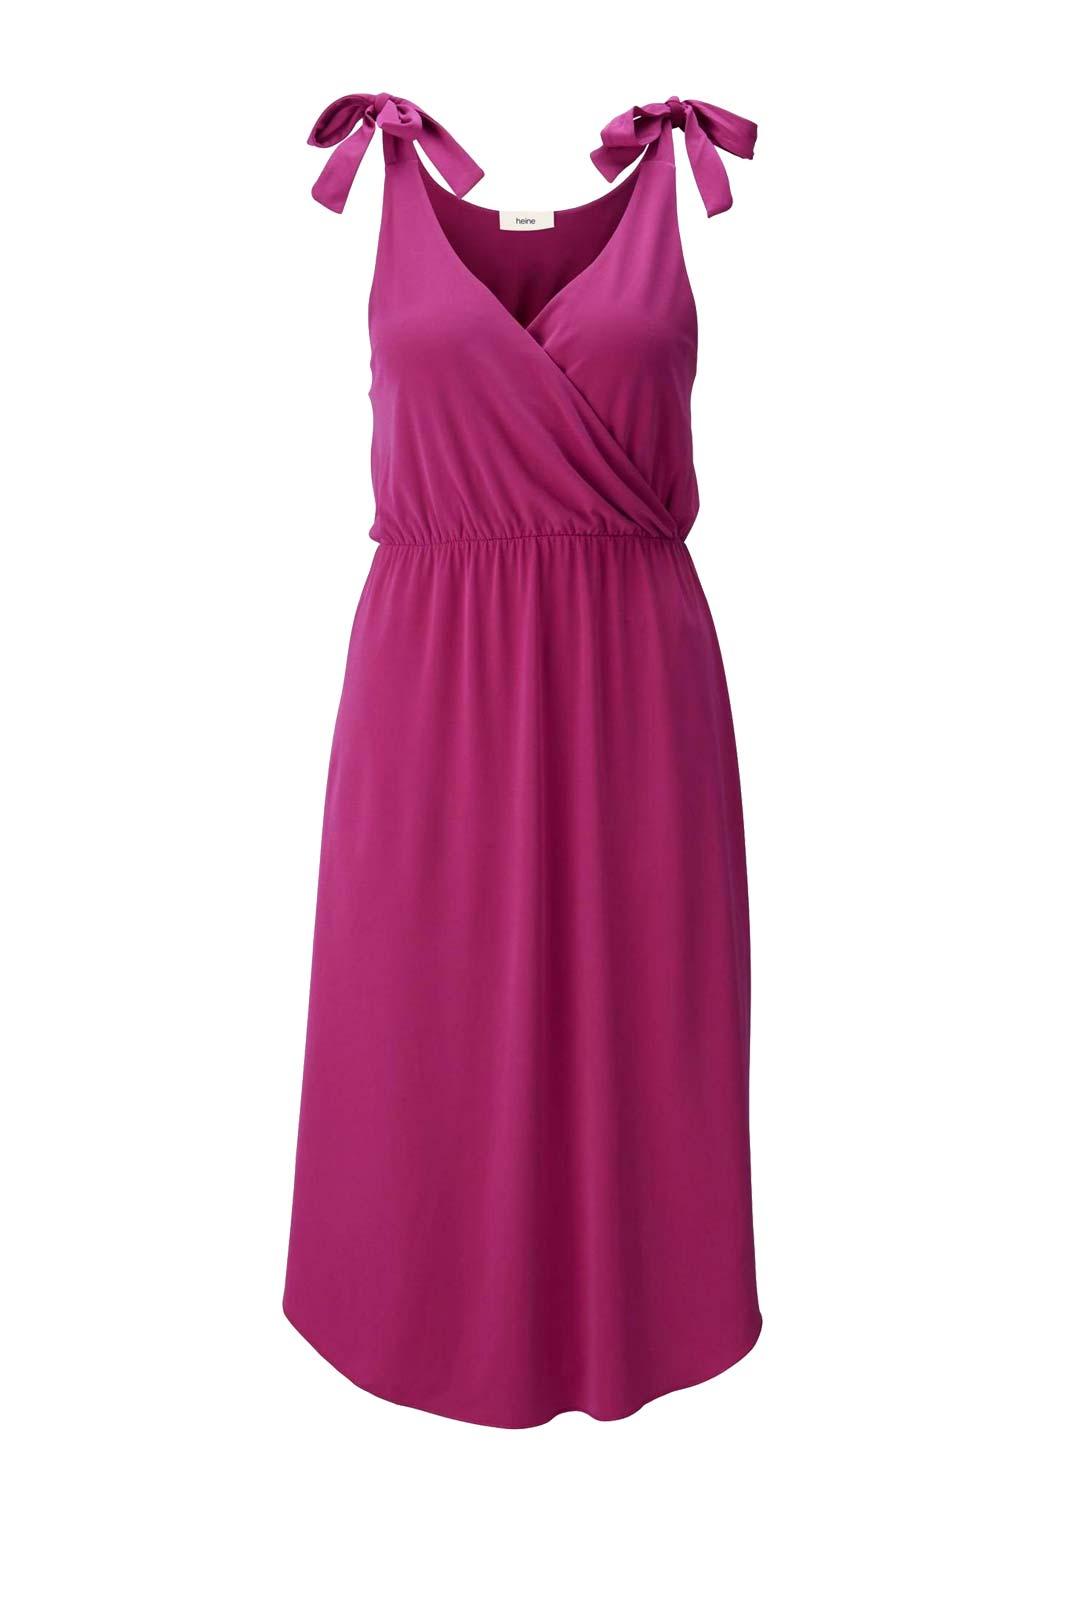 497.915 Sommerkleid Damen Pink ärmellos Jerseykleid Damenkleid knielang Urlaub